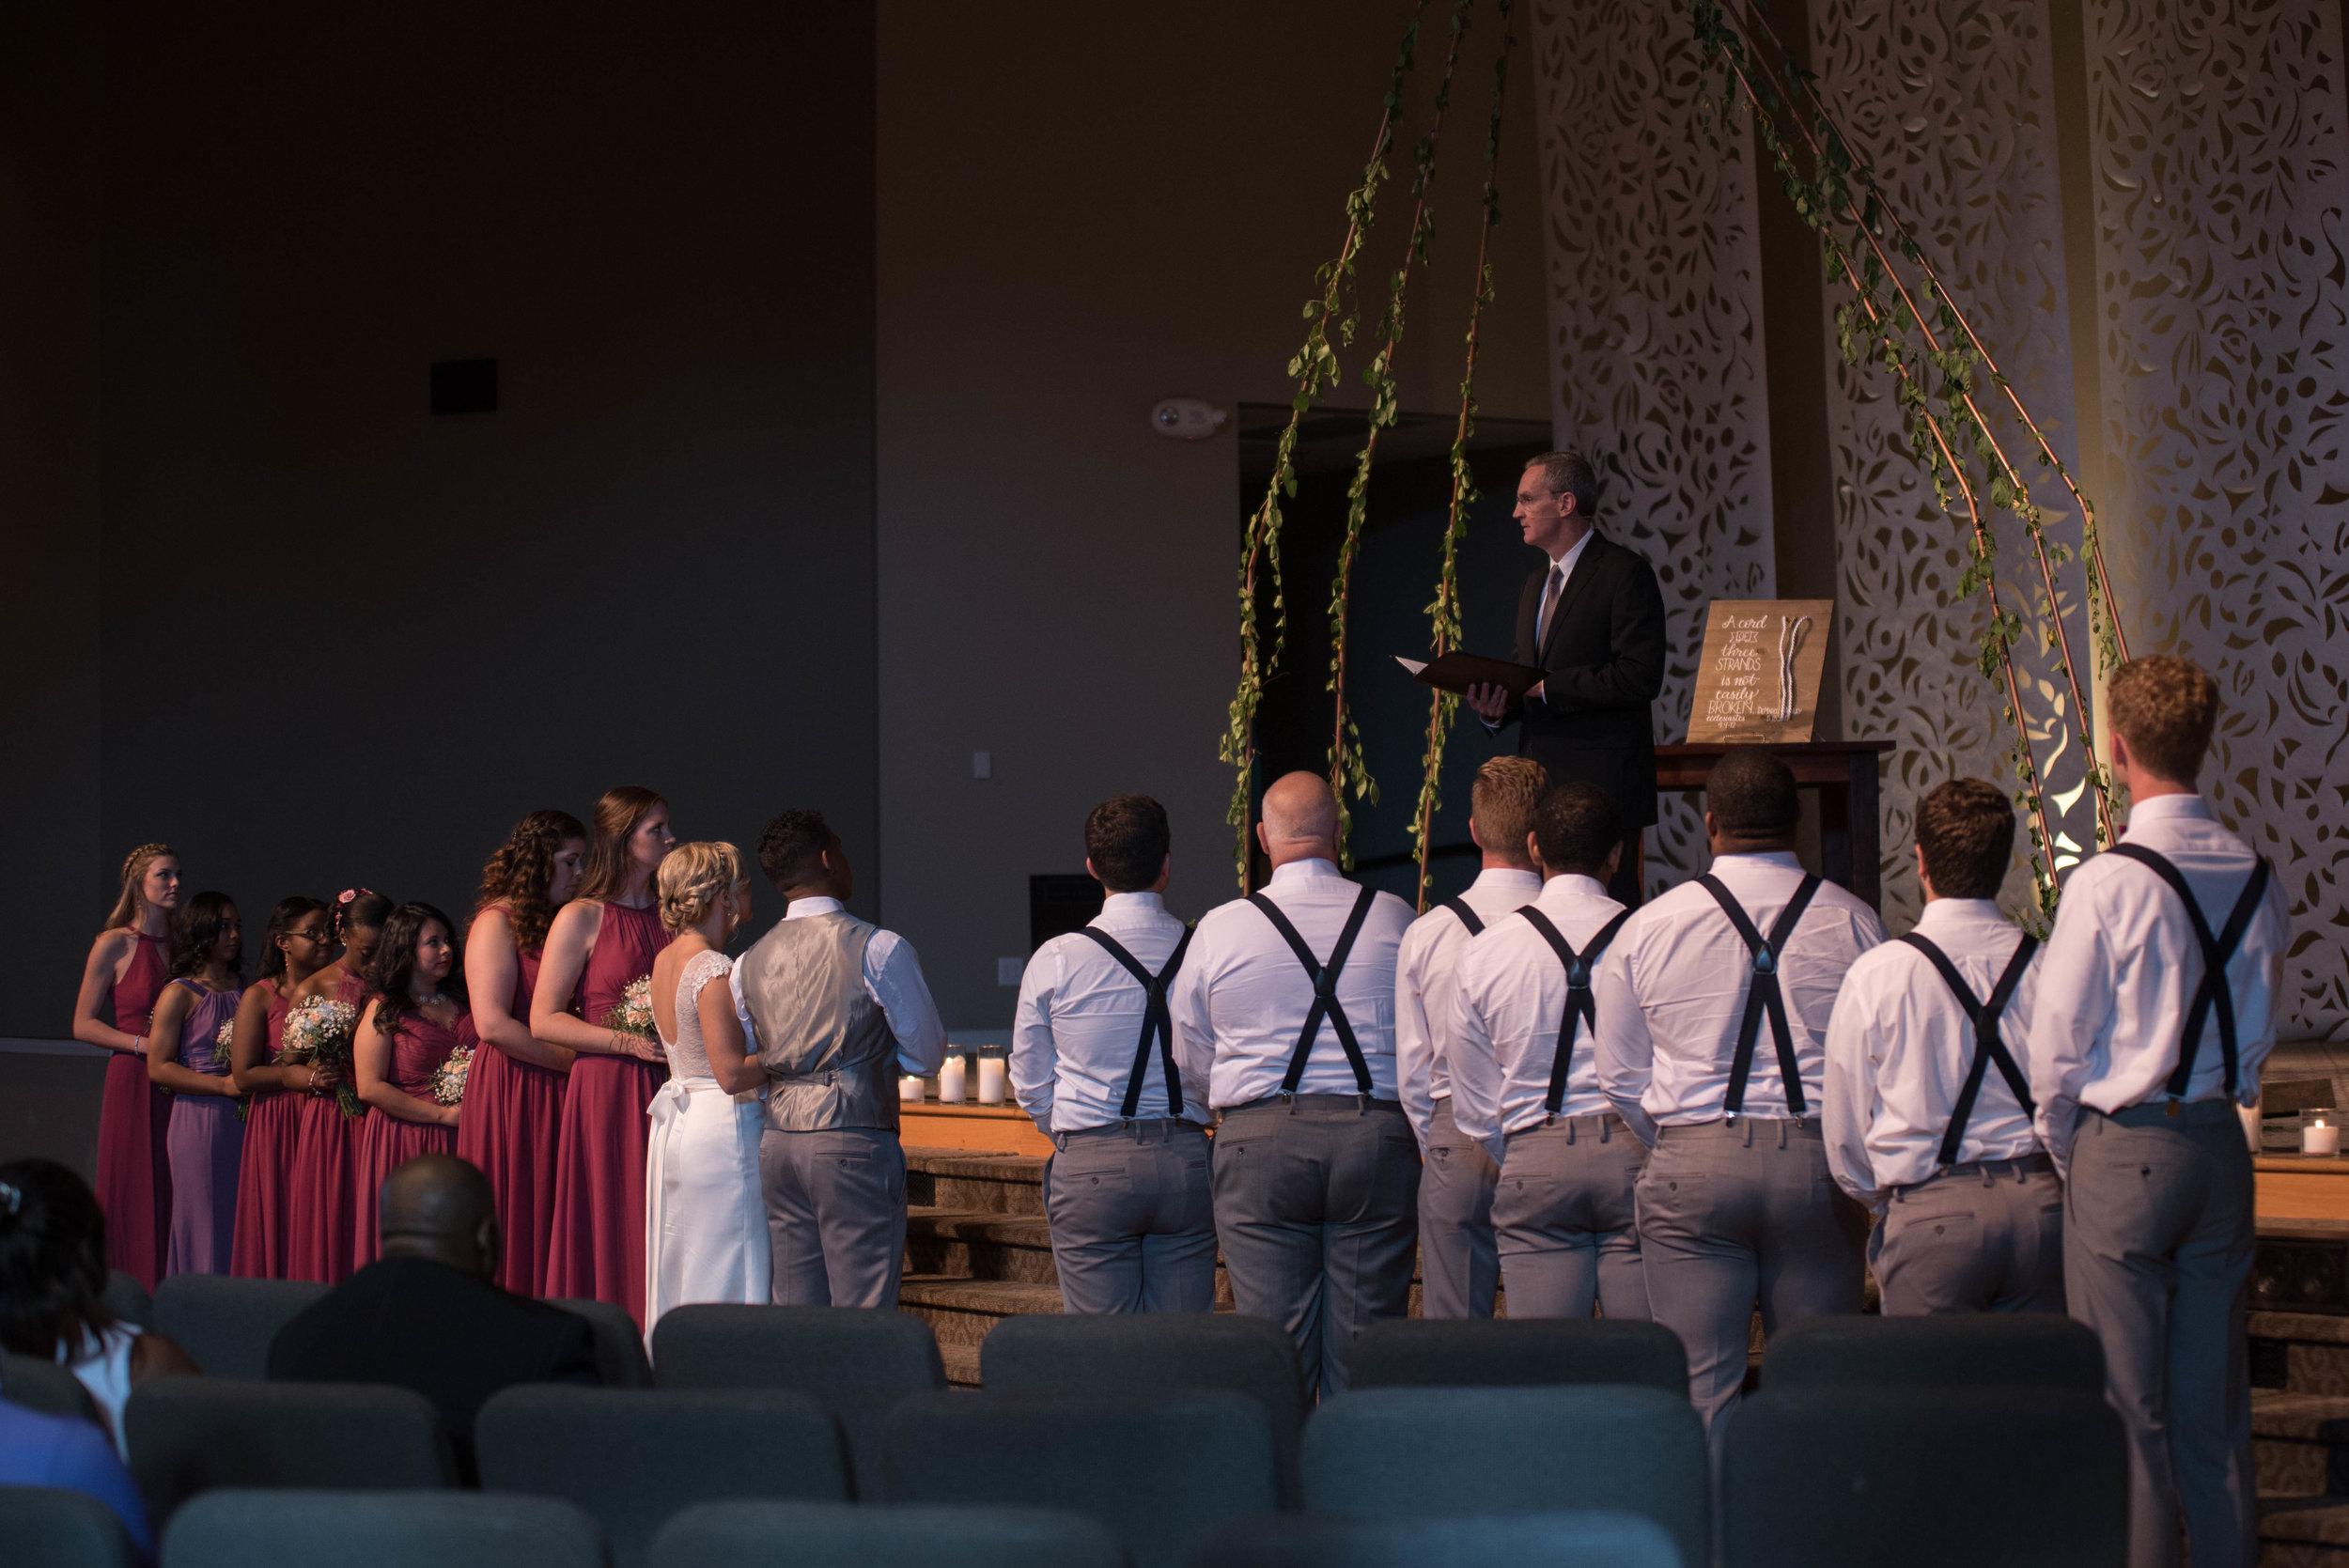 ceremony-076.jpg